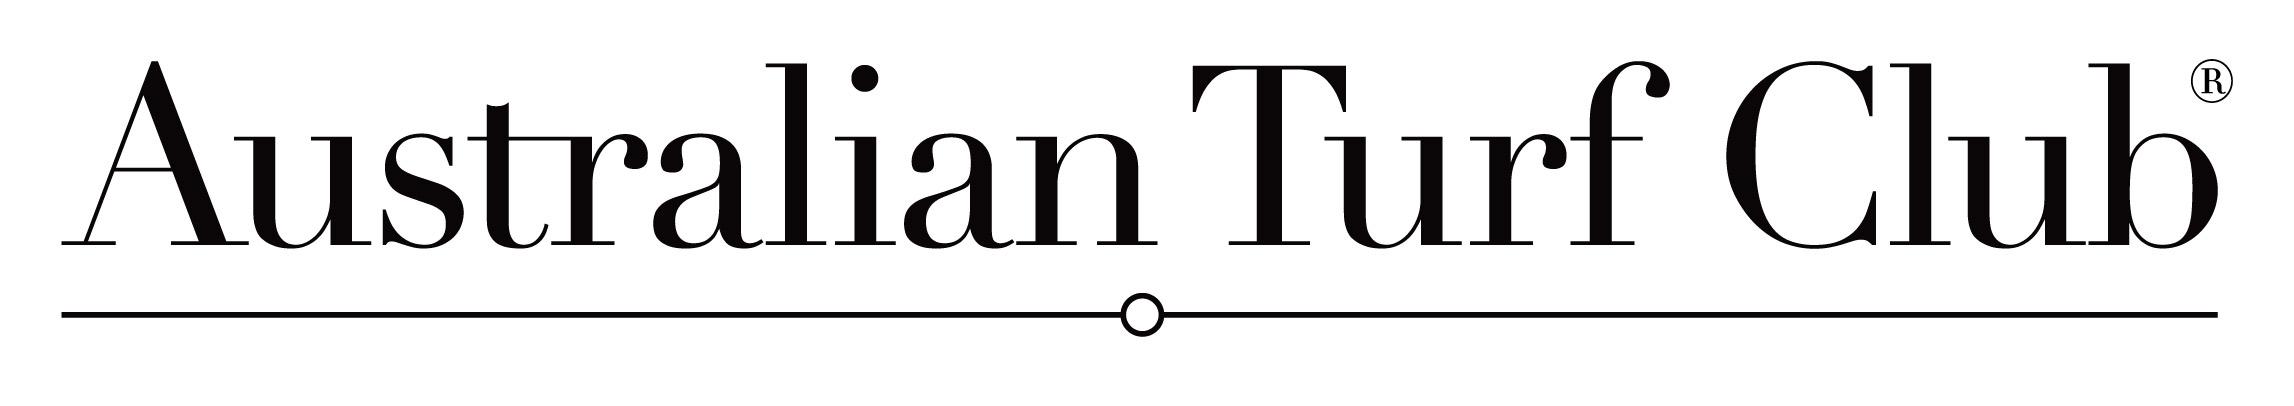 Australian_Turf_Club.jpg